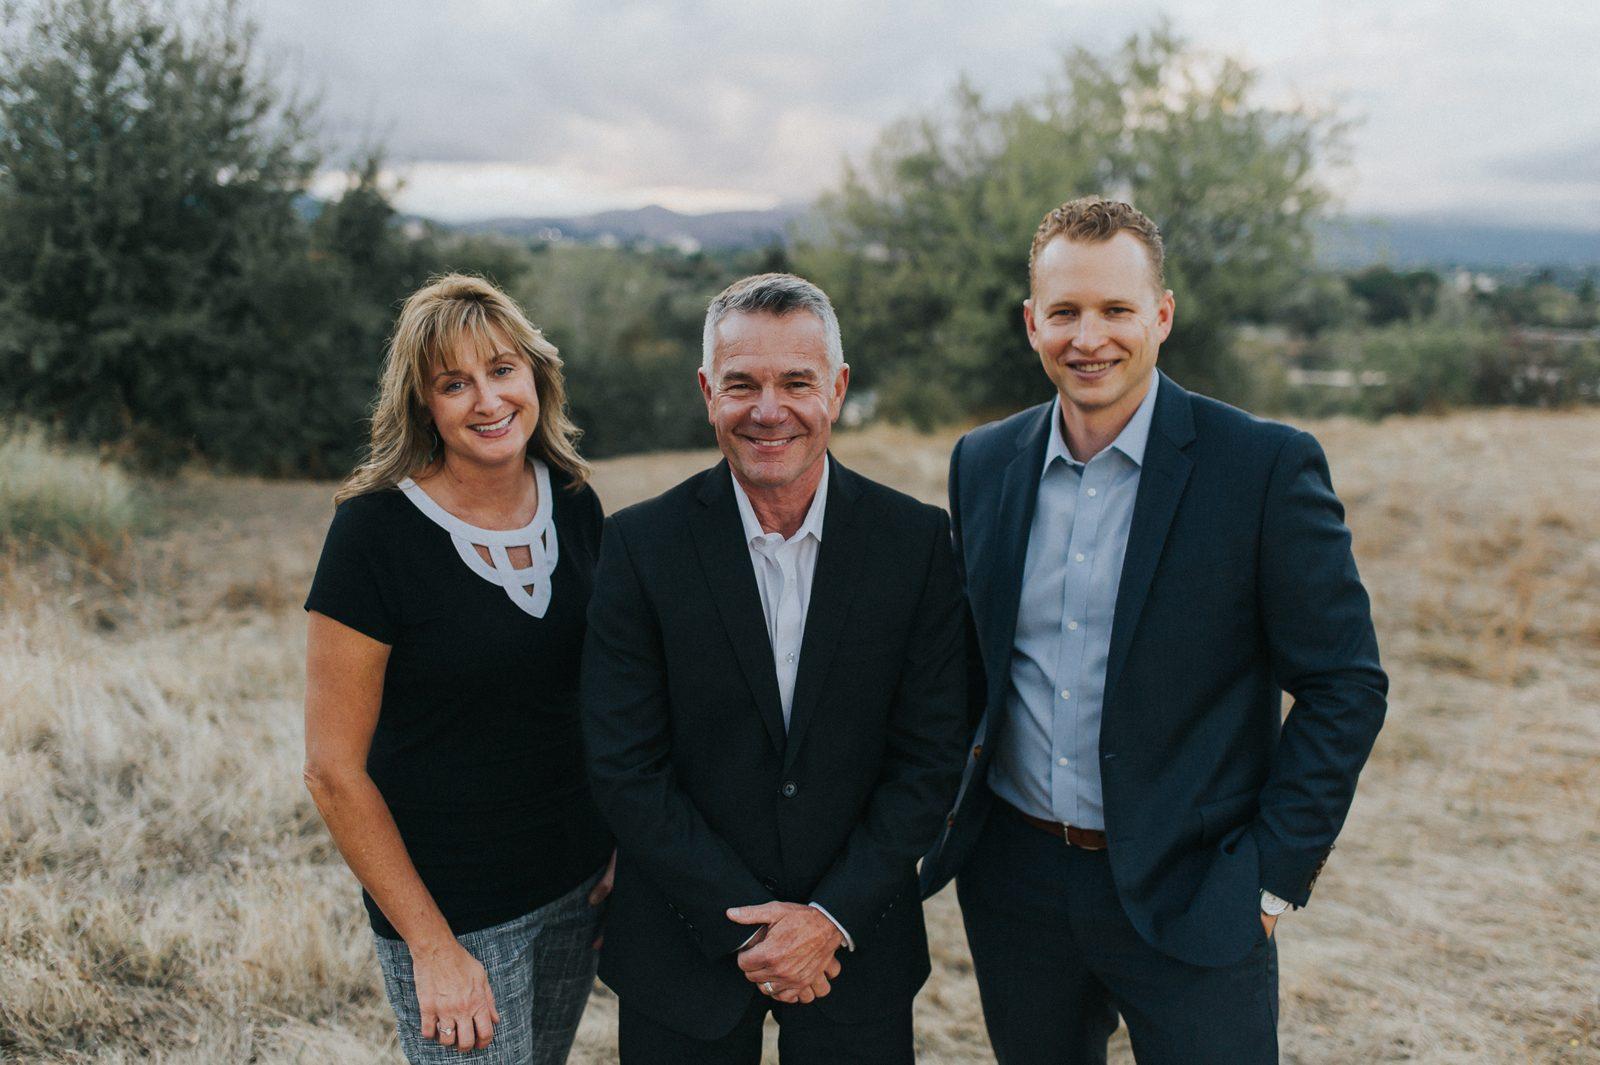 The Pathfinder Group | Redding, CA | Morgan Stanley Wealth